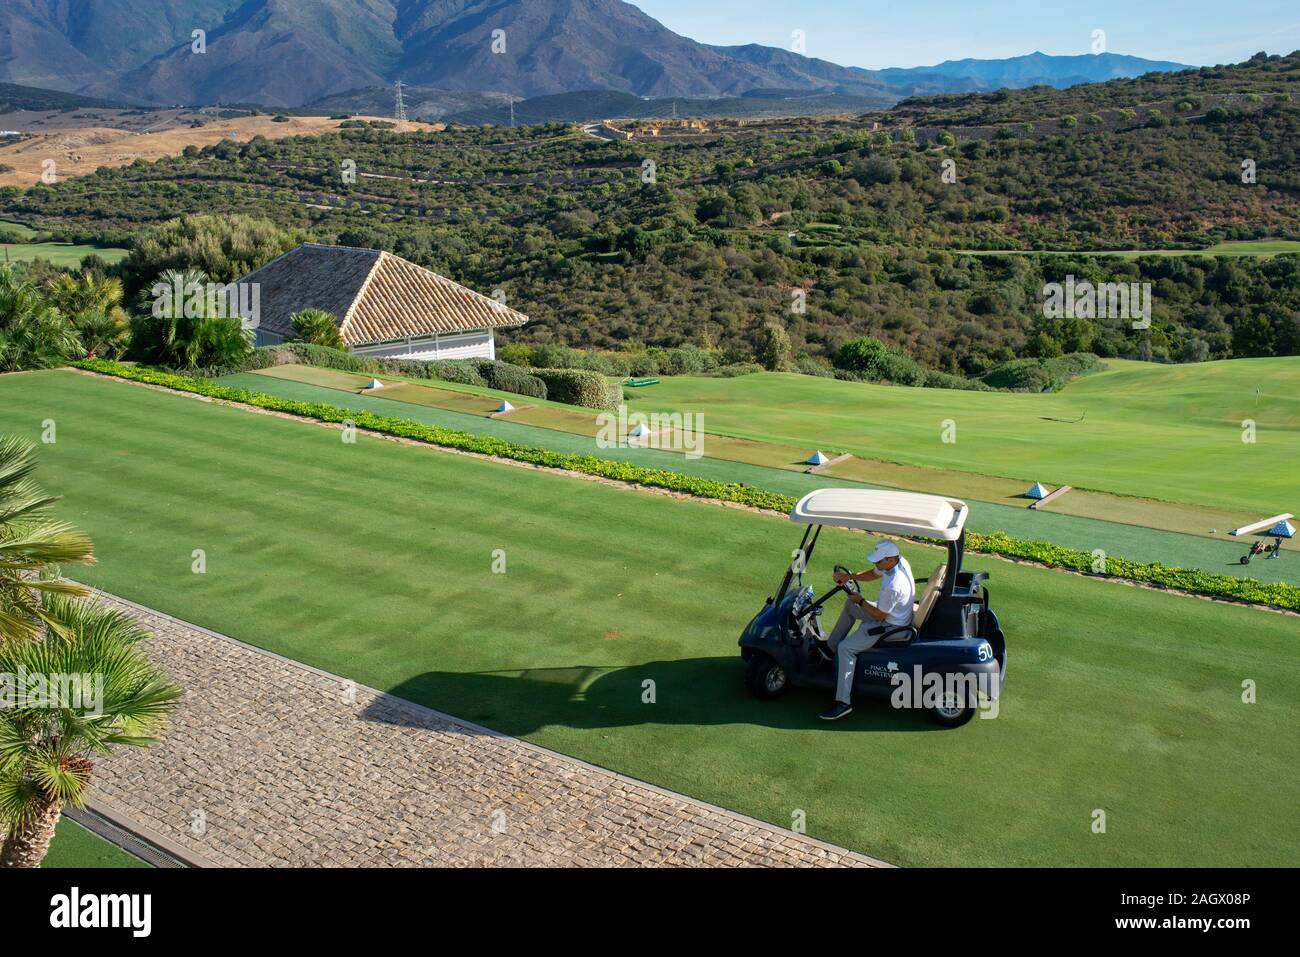 Campo de Golf de Finca Cortesin hotel en Málaga Costa del Sol Andalucía España Foto de stock